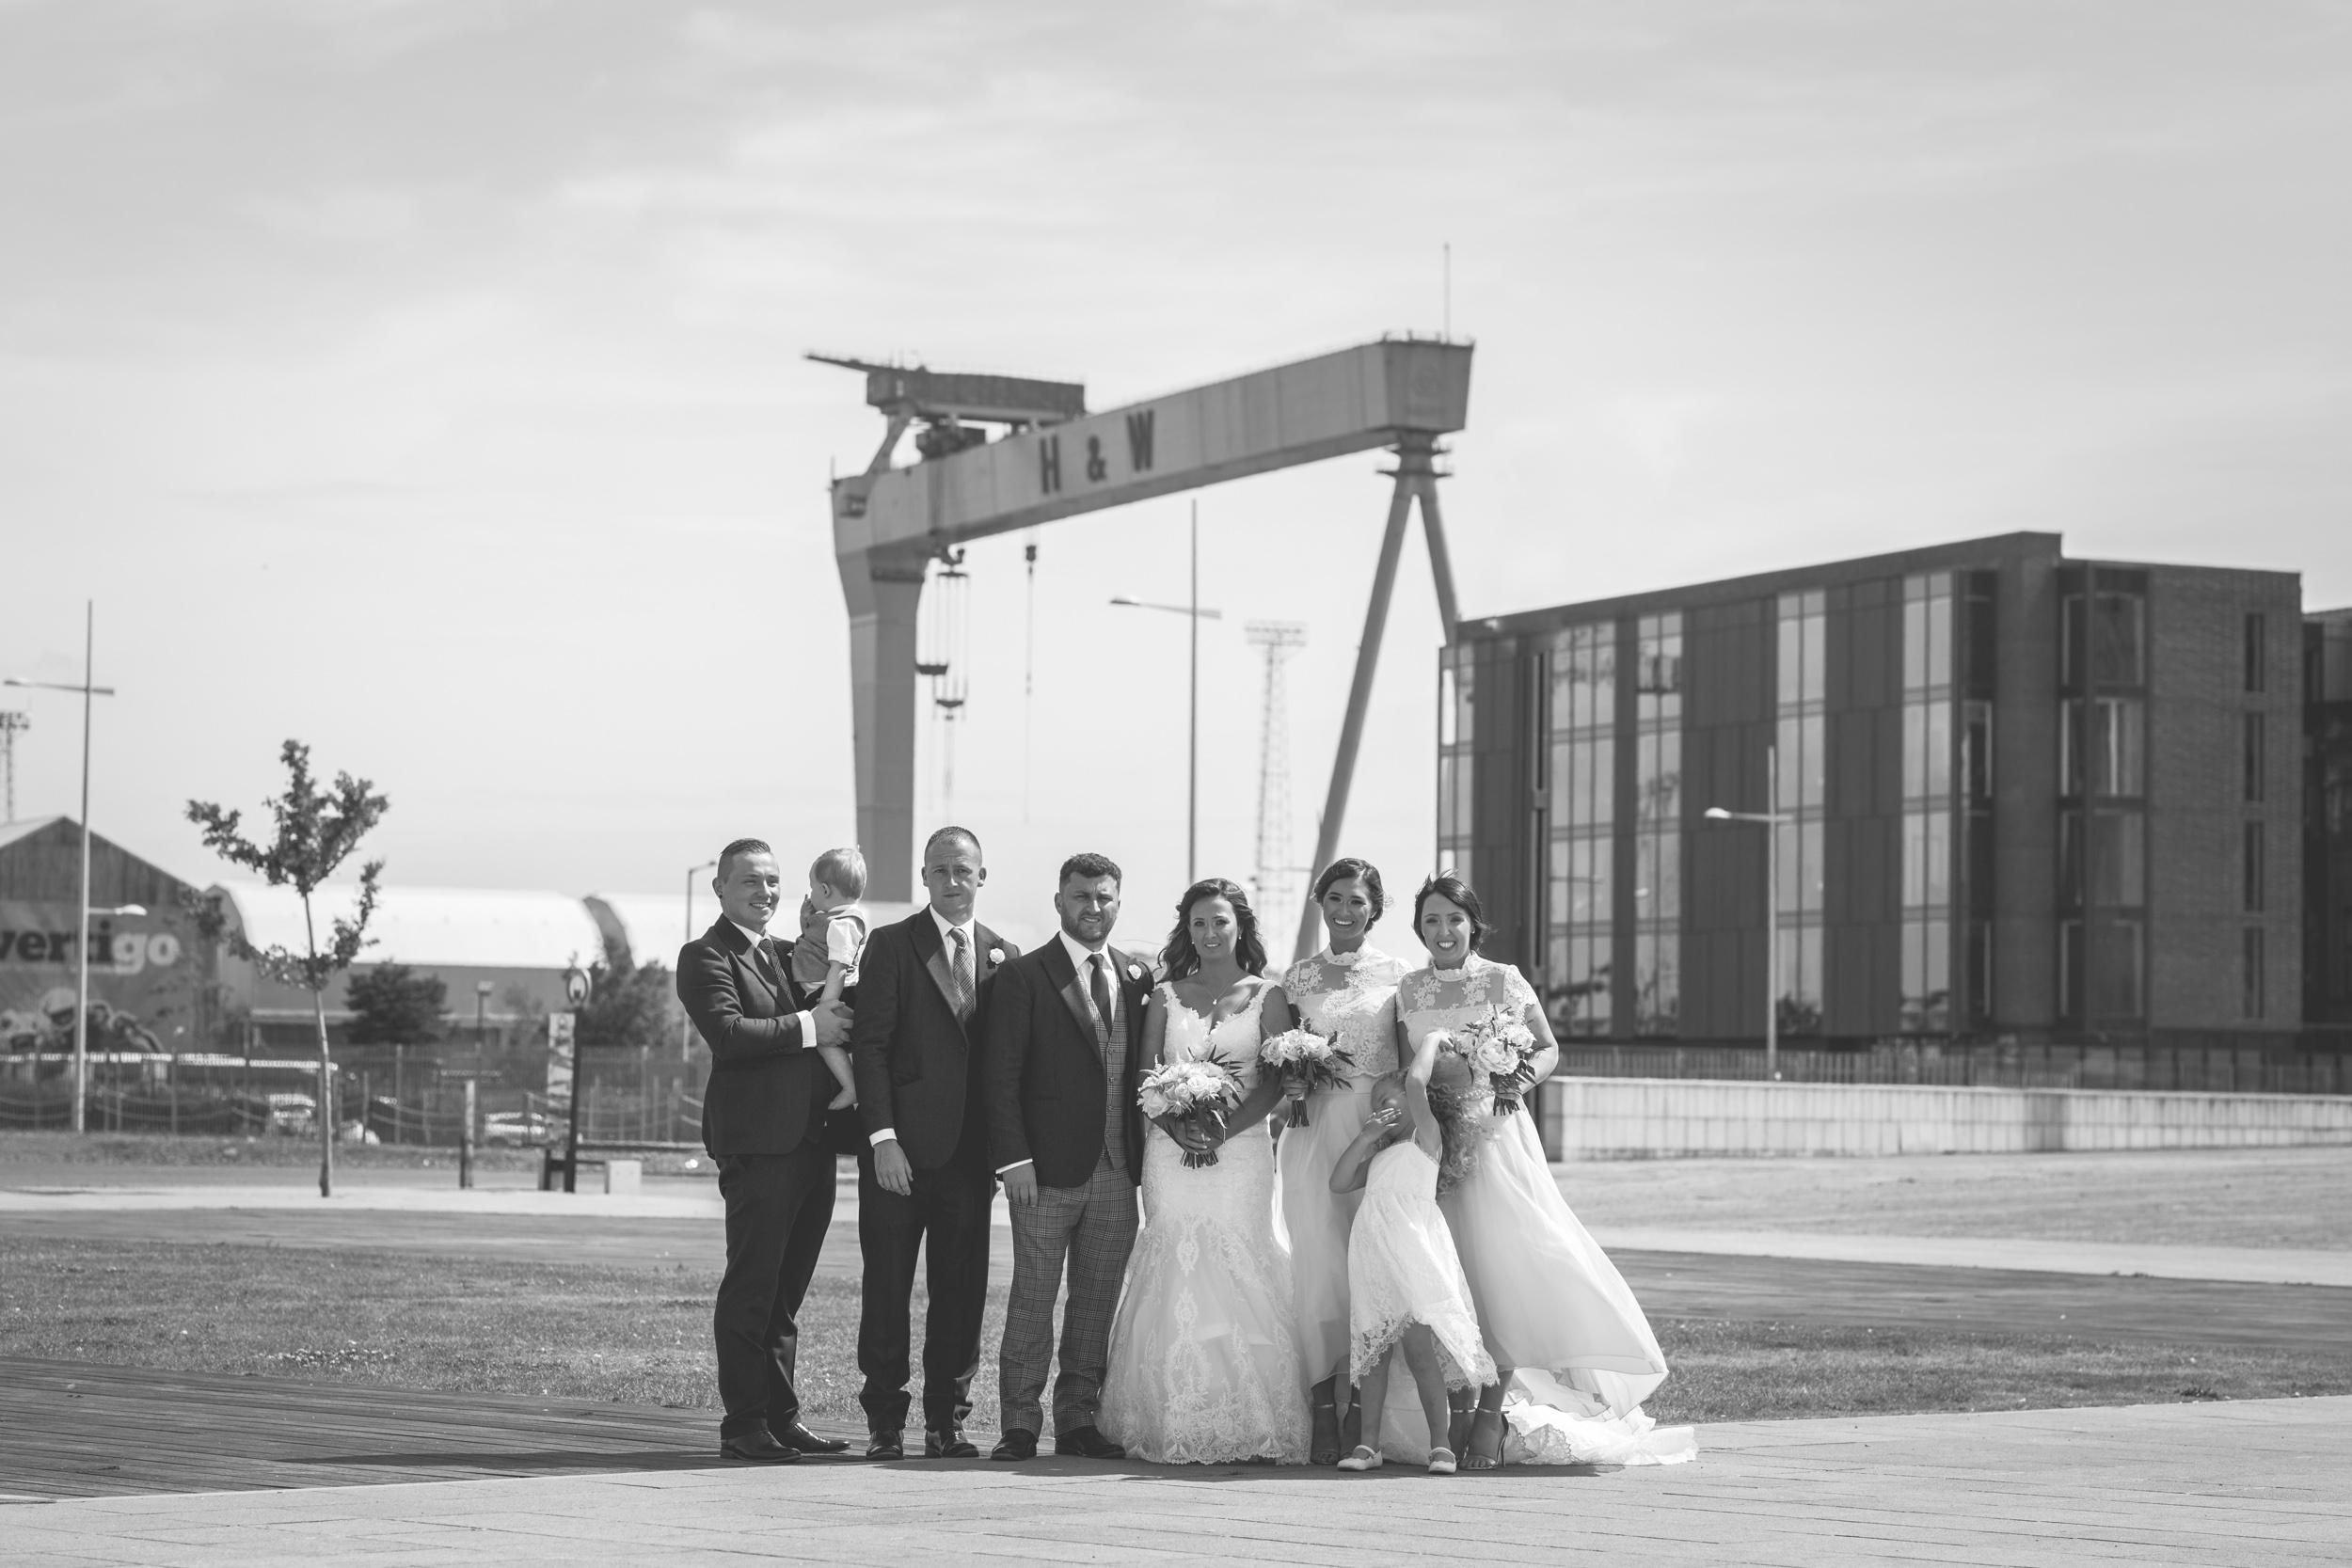 Brian McEwan   Northern Ireland Wedding Photographer   Rebecca & Michael   Portraits-49.jpg